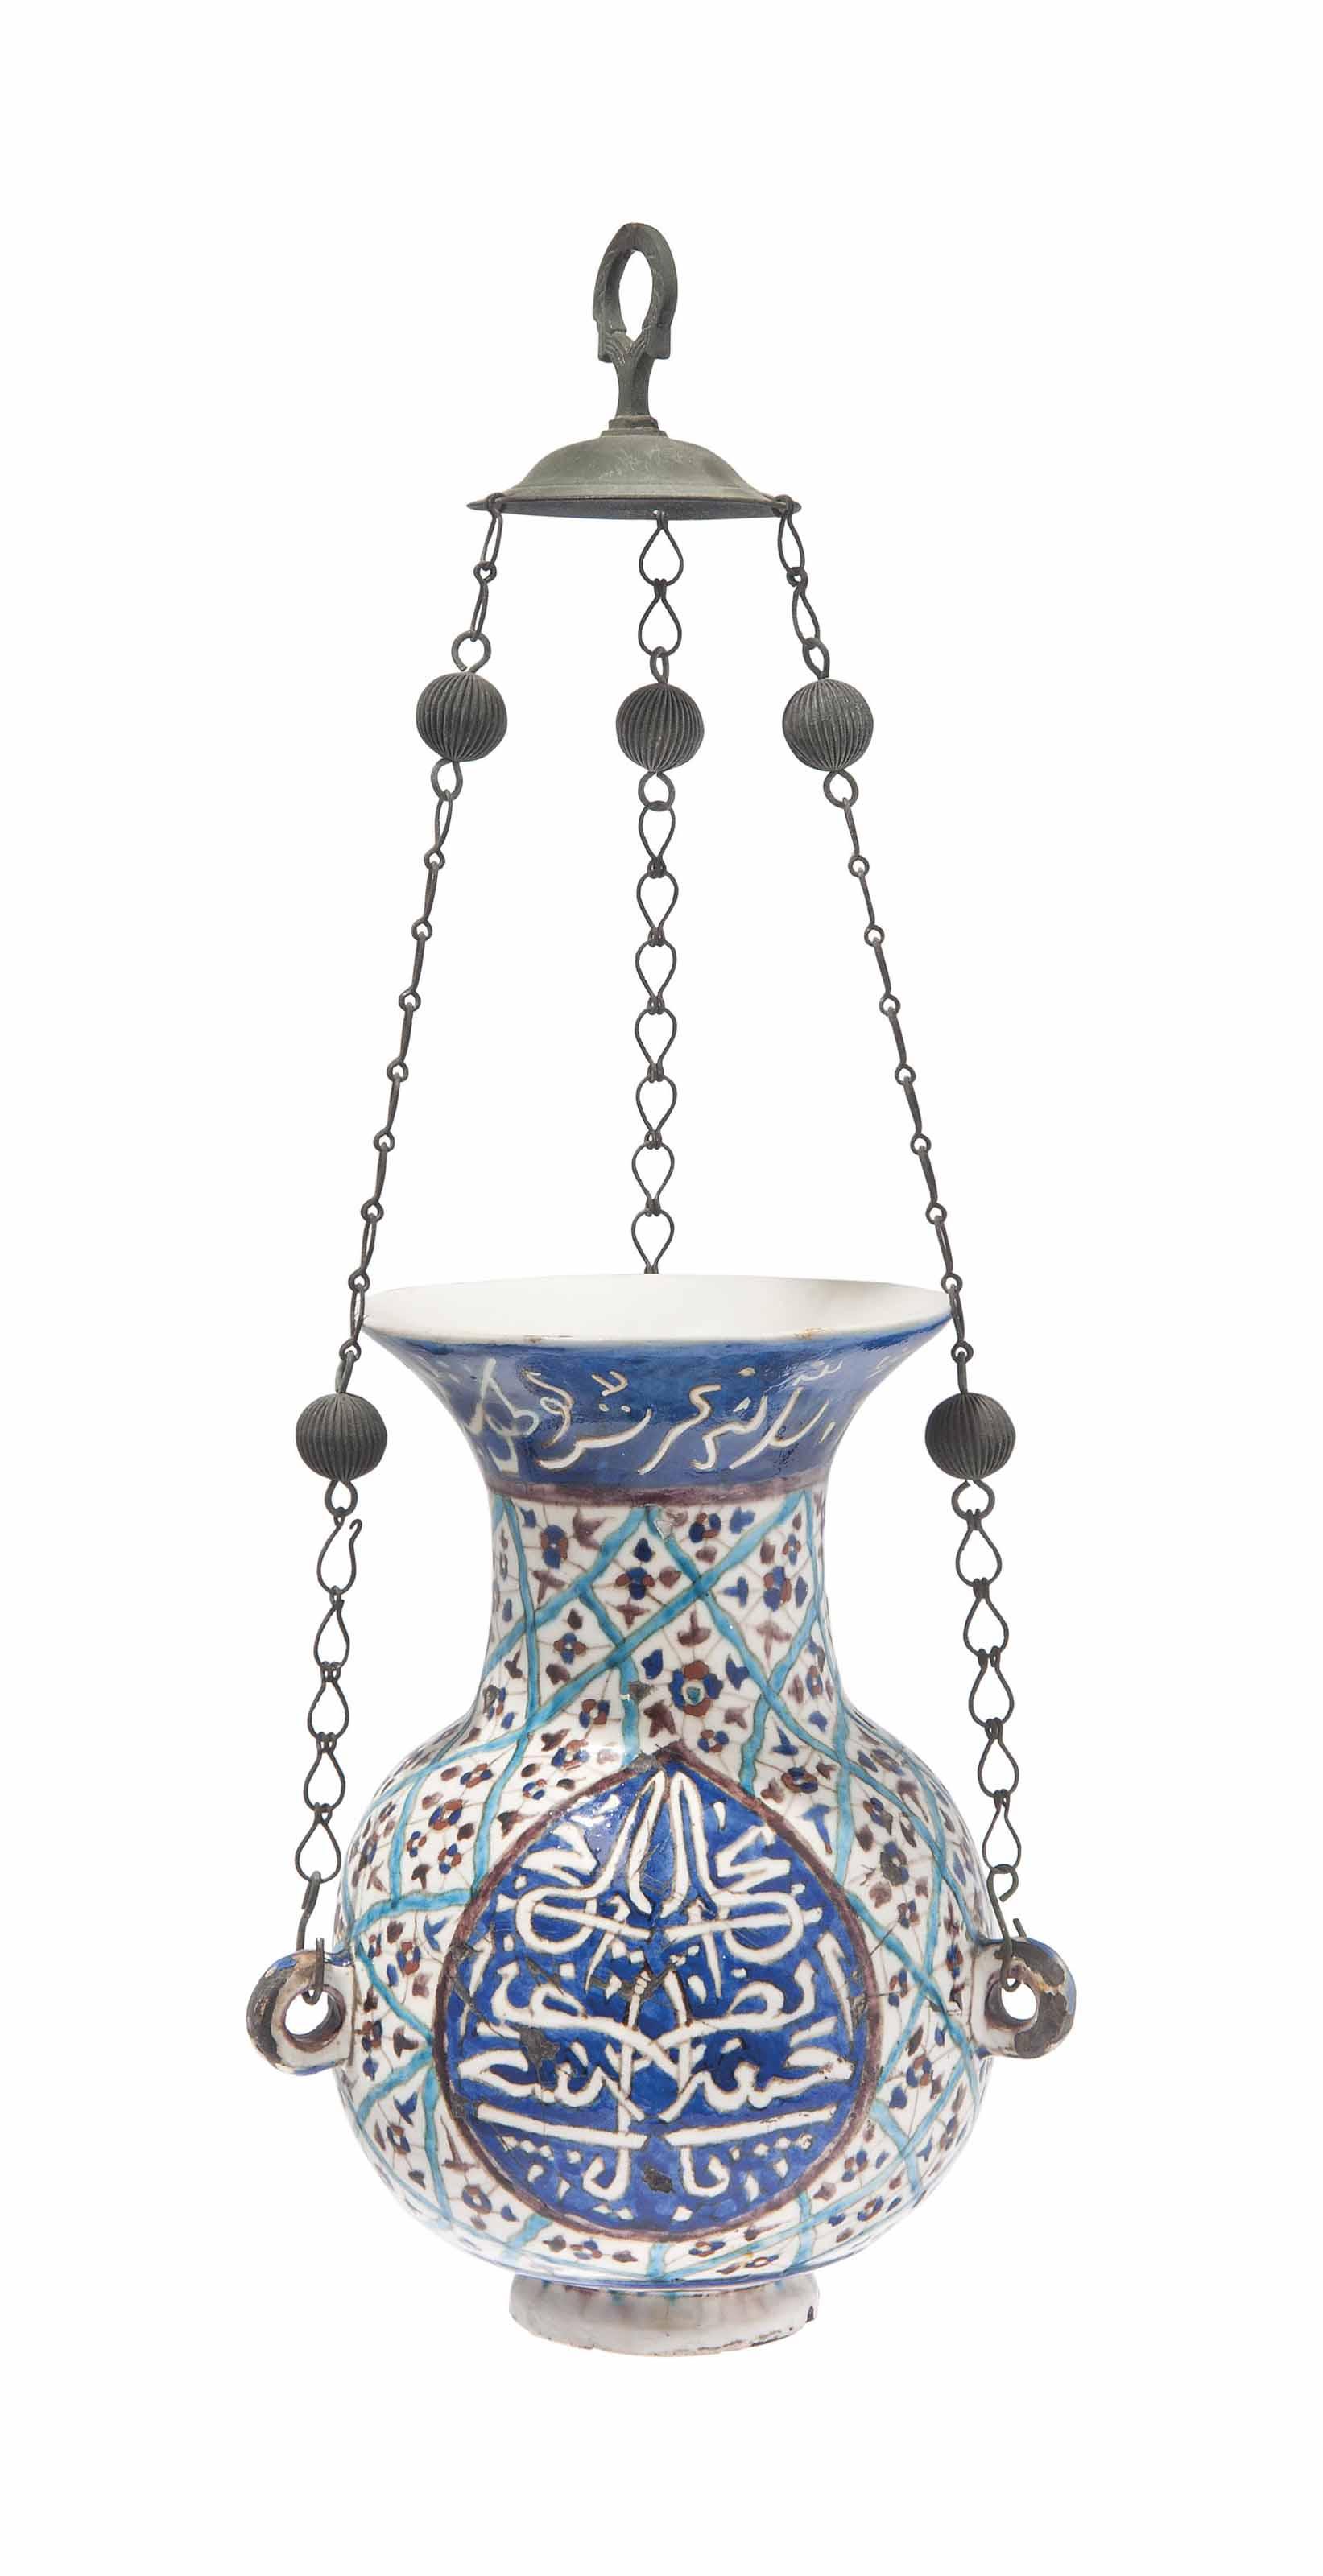 A KUTAHYA POTTERY MOSQUE LAMP